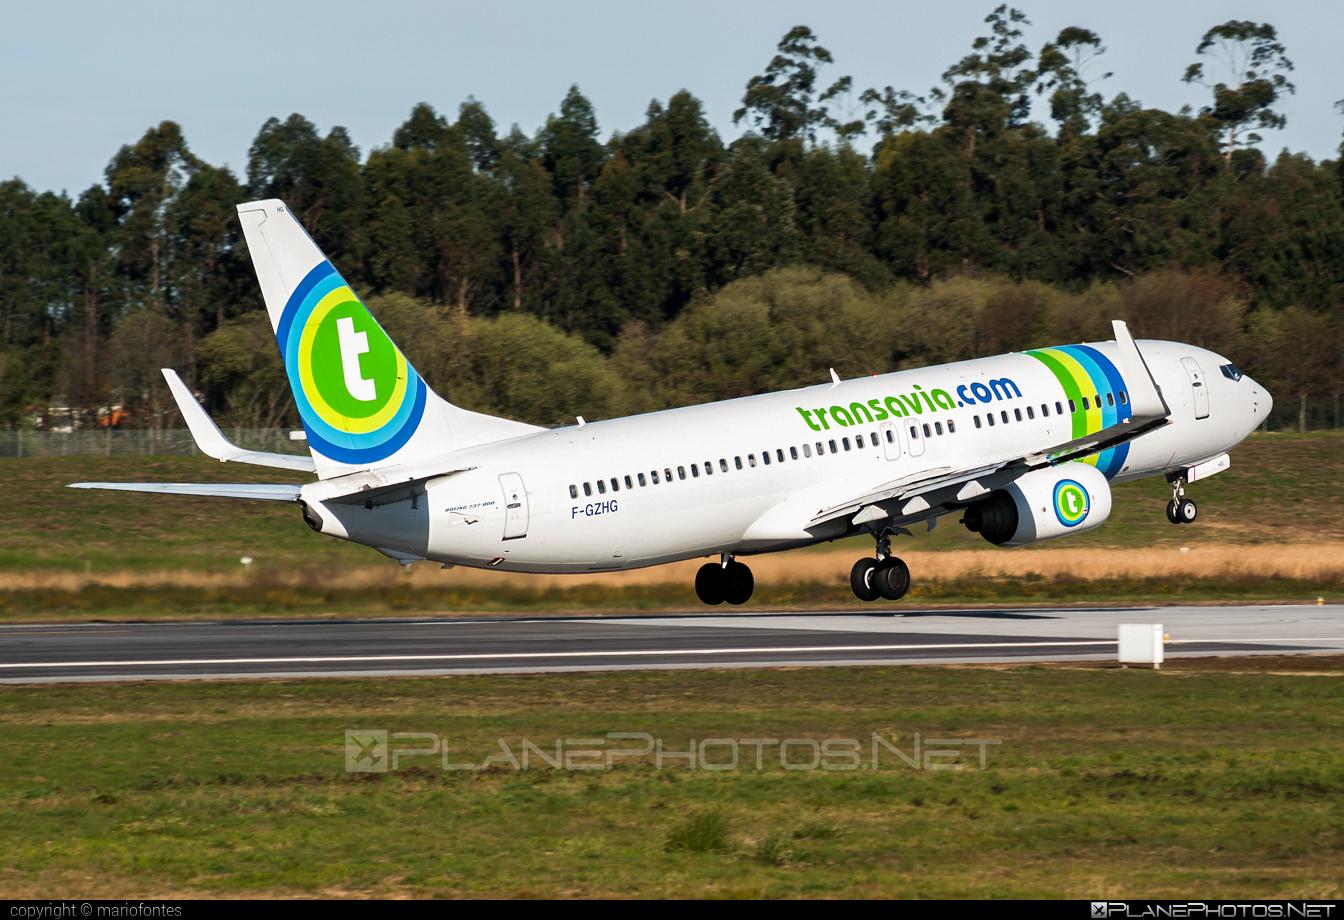 Boeing 737-800 - F-GZHG operated by Transavia France #b737 #b737nextgen #b737ng #boeing #boeing737